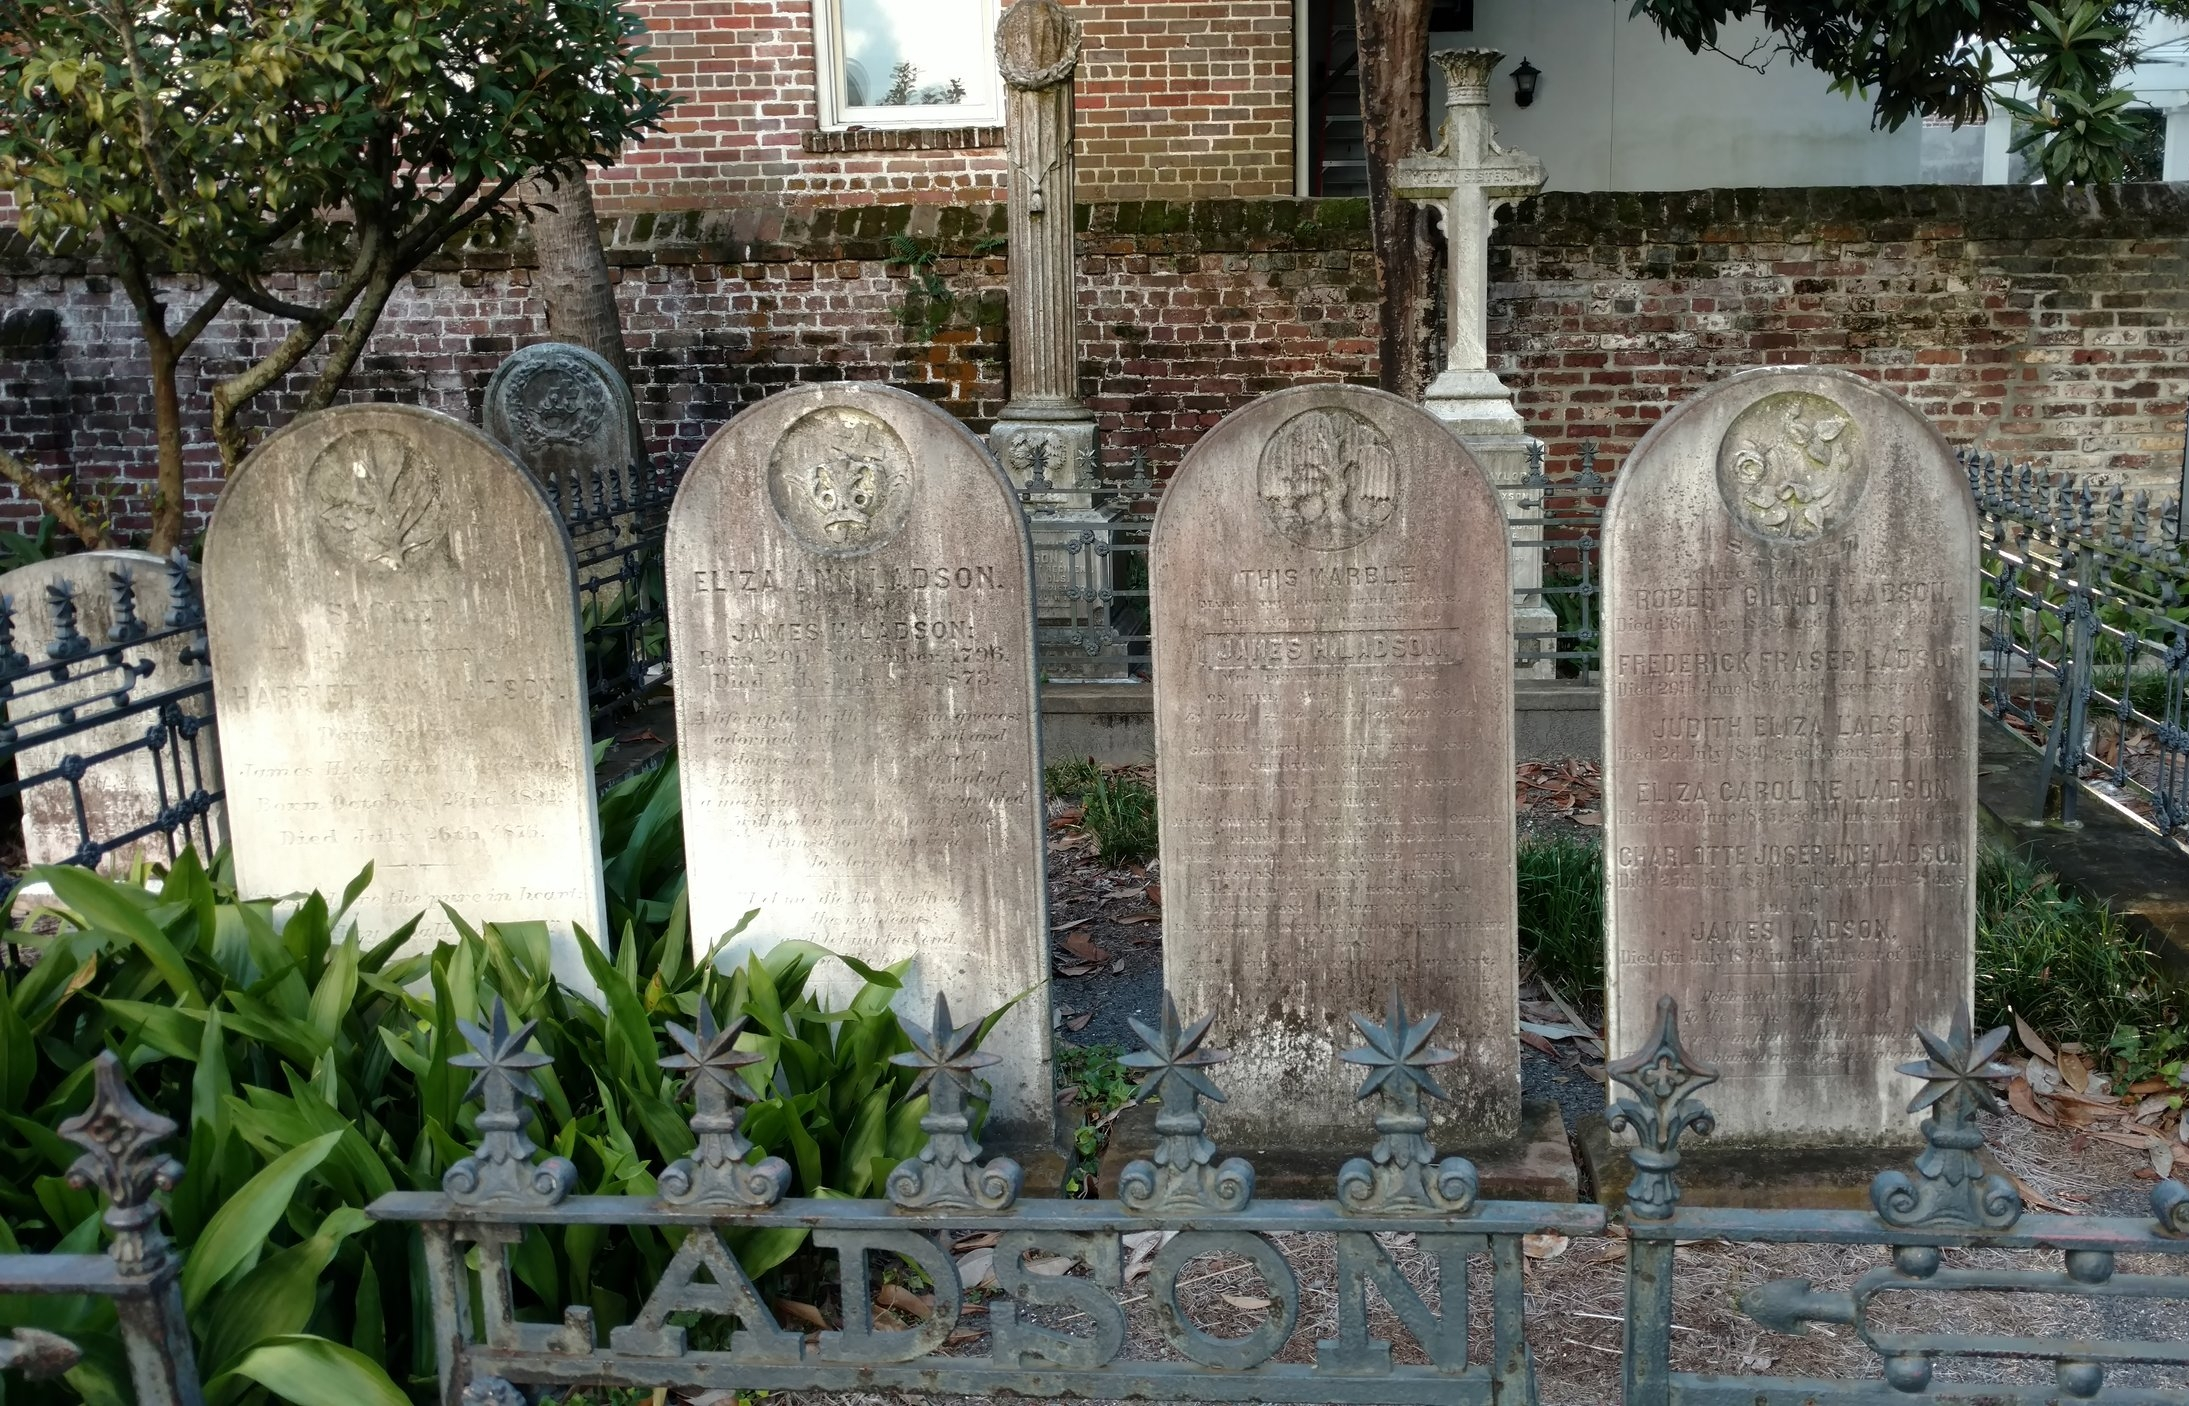 St. Michael's Graveyard